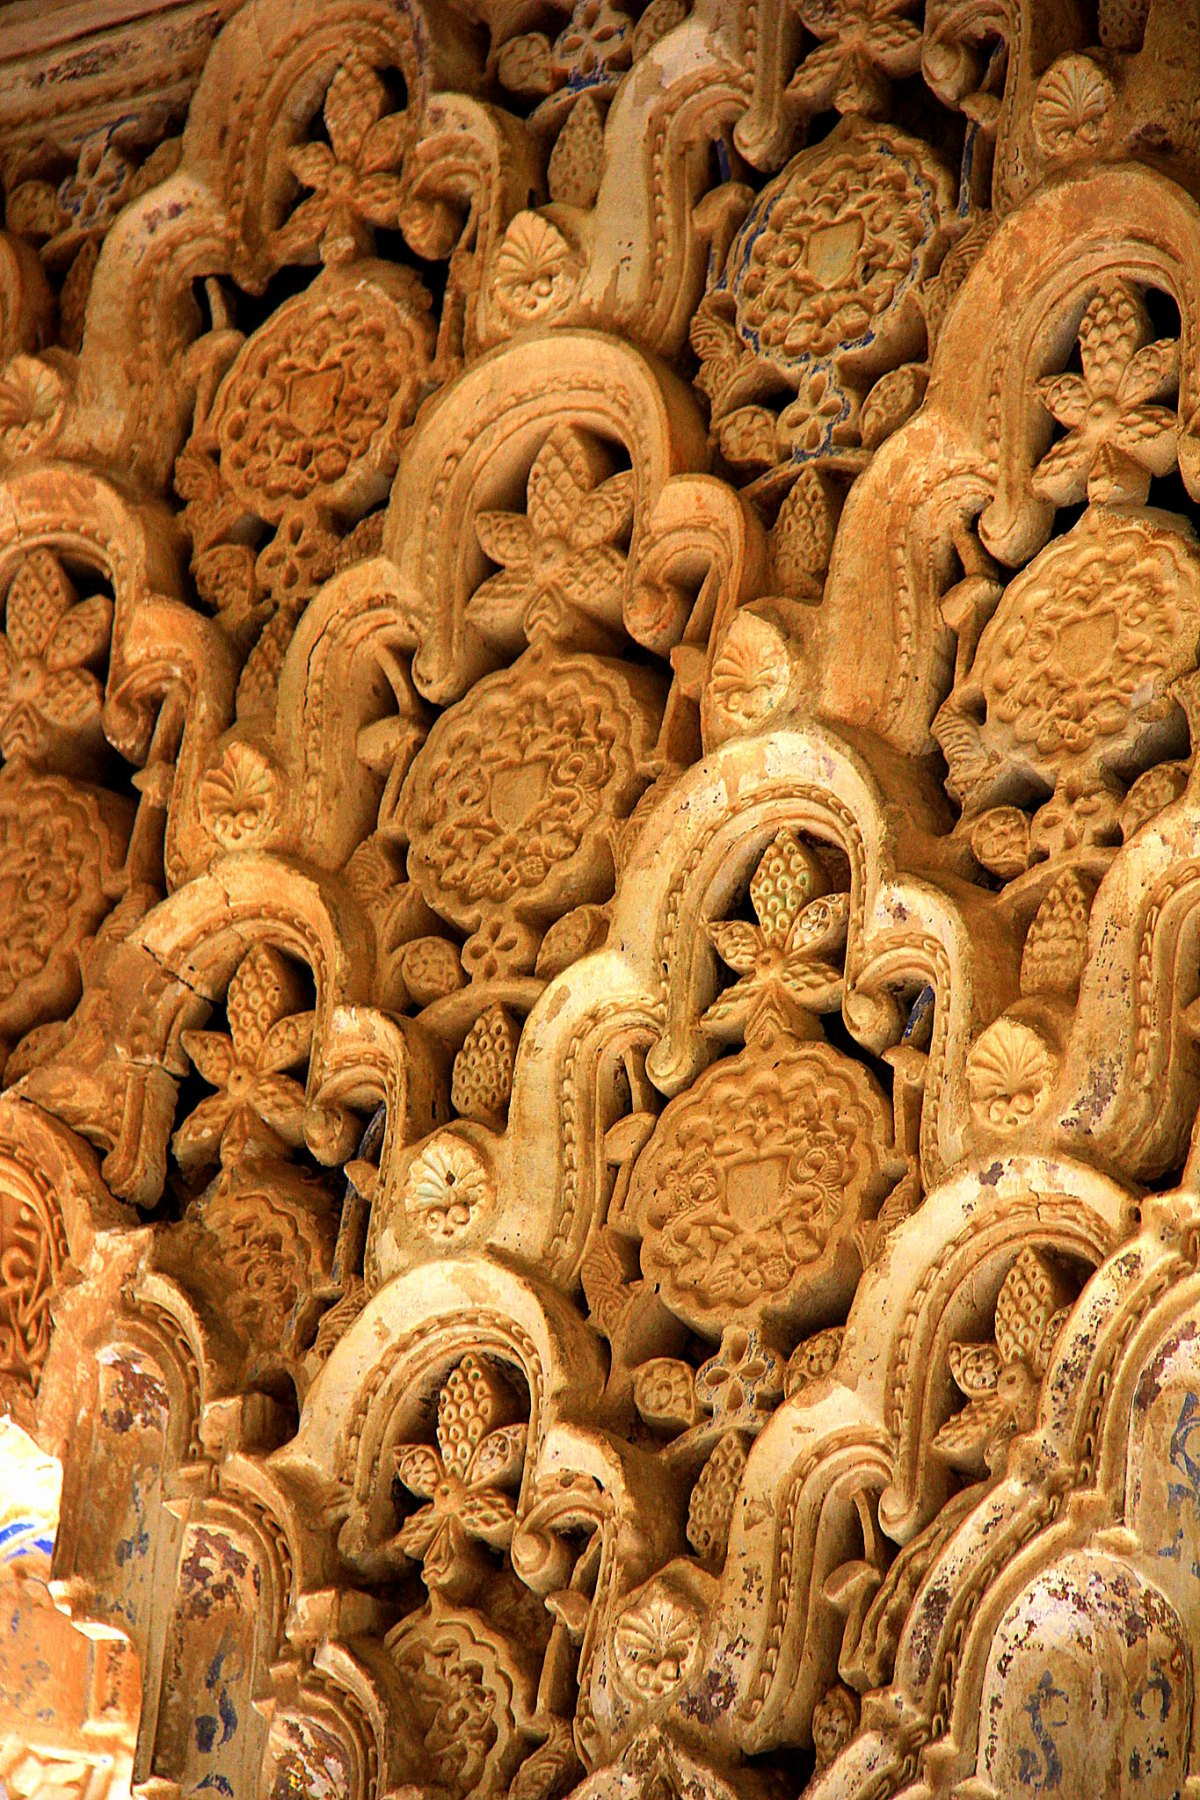 Ataurique patterns found at Nasrid Palaces